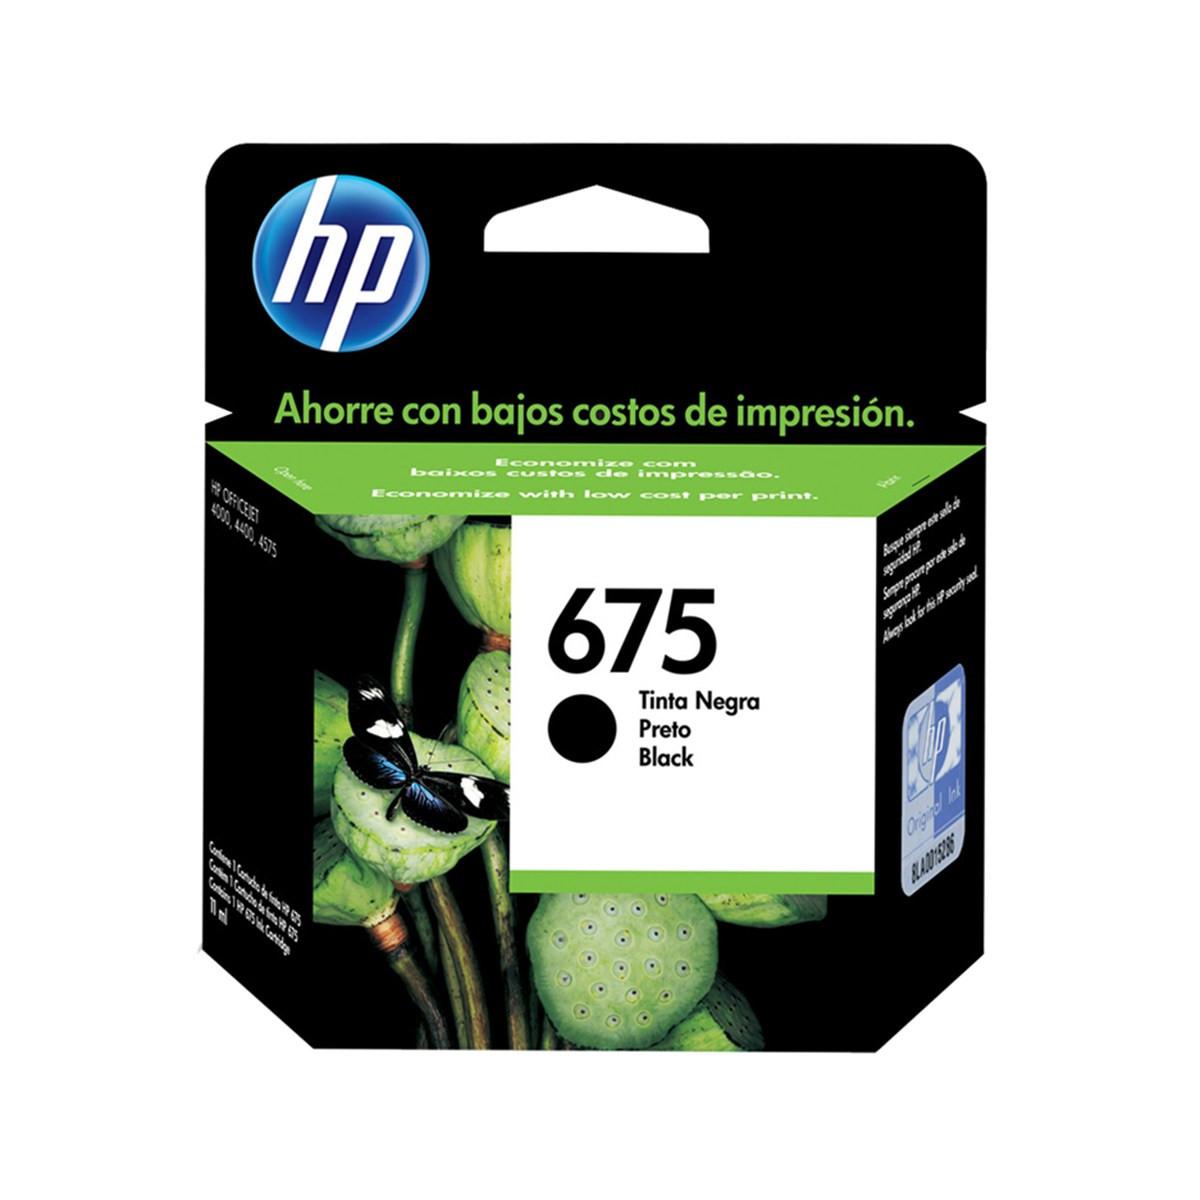 Cartucho de Tinta HP 675 CN690AL   Preto   Original HP   13,5 ml